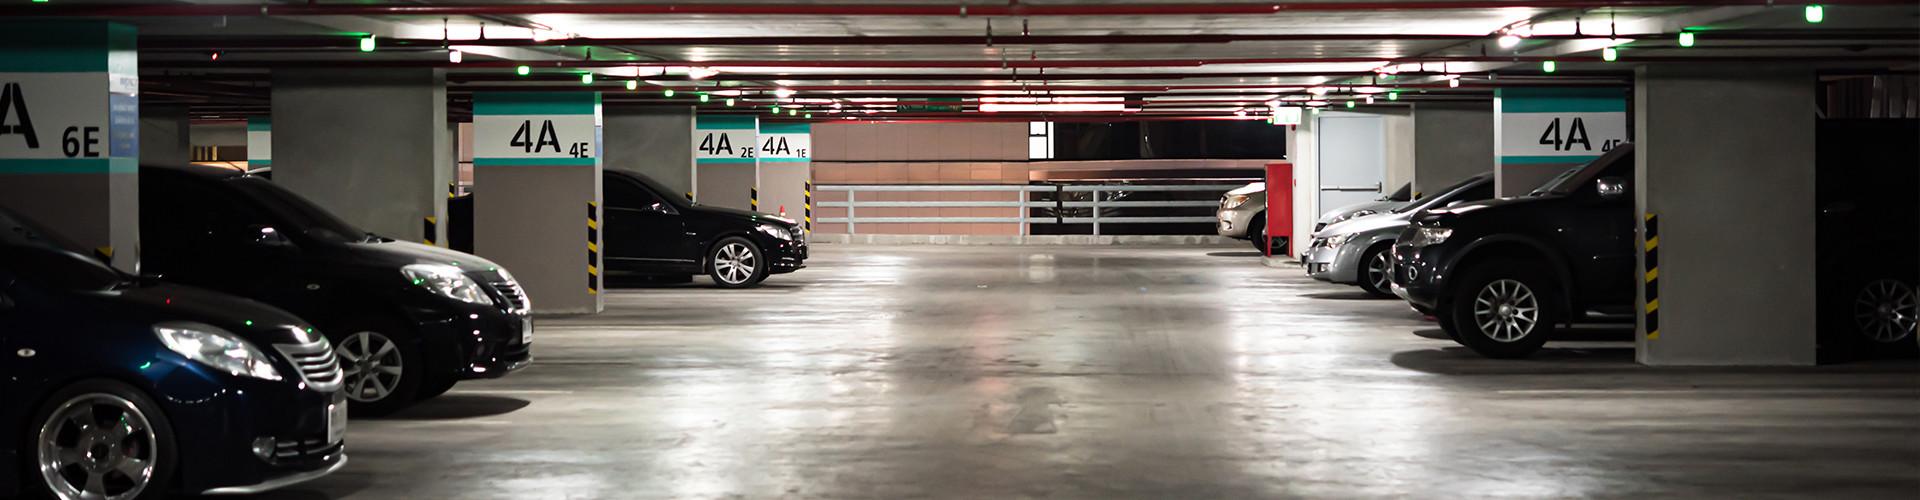 antislip coating garages